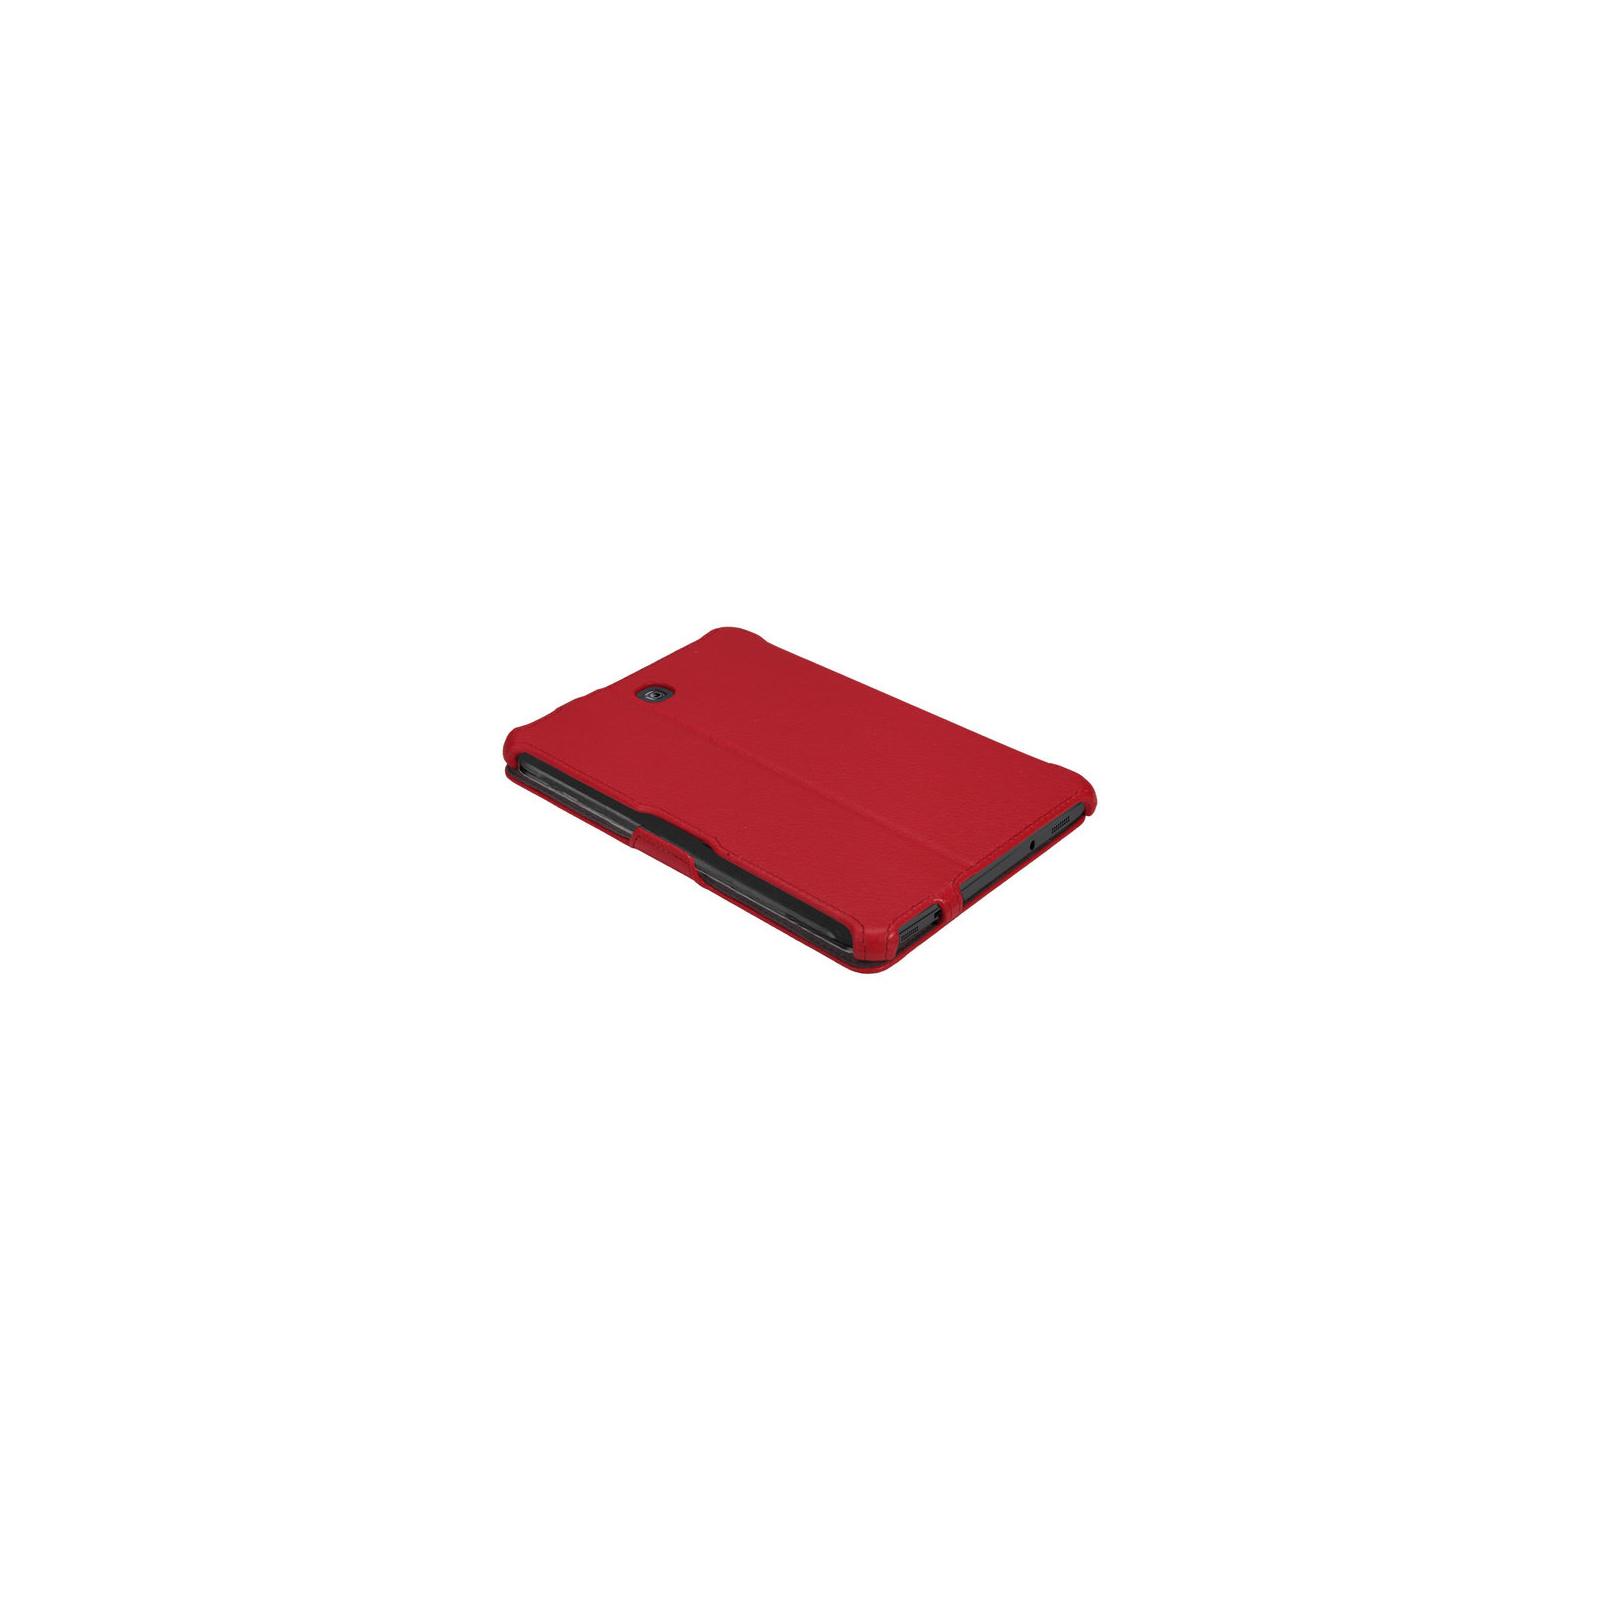 Чехол для планшета AirOn для Samsung Galaxy Tab S 2 8.0 red (4822352777524) изображение 4